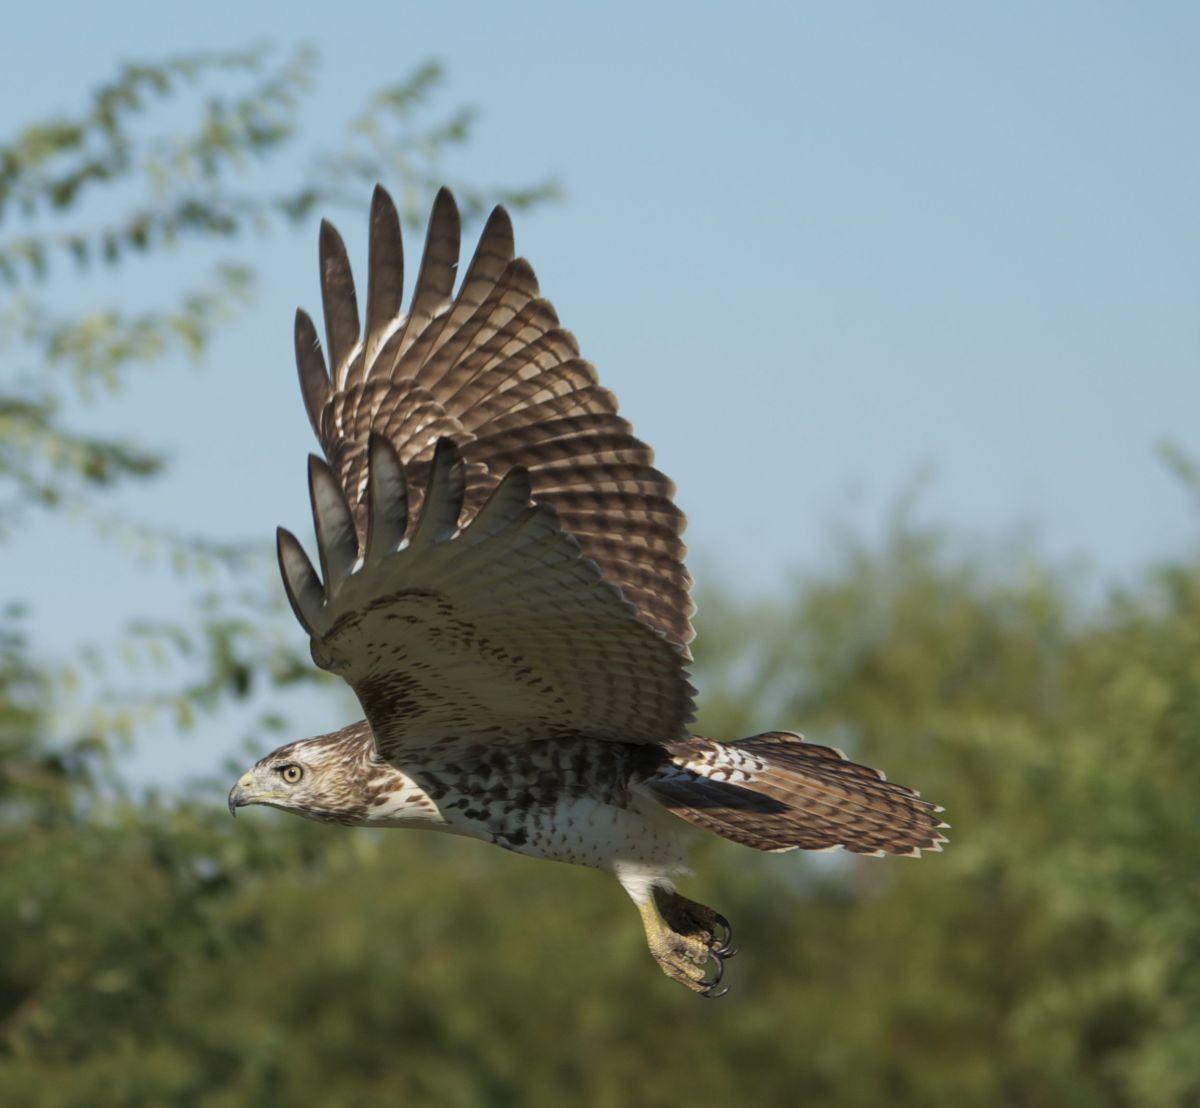 Birding the Oklahoma Skies for Hawks